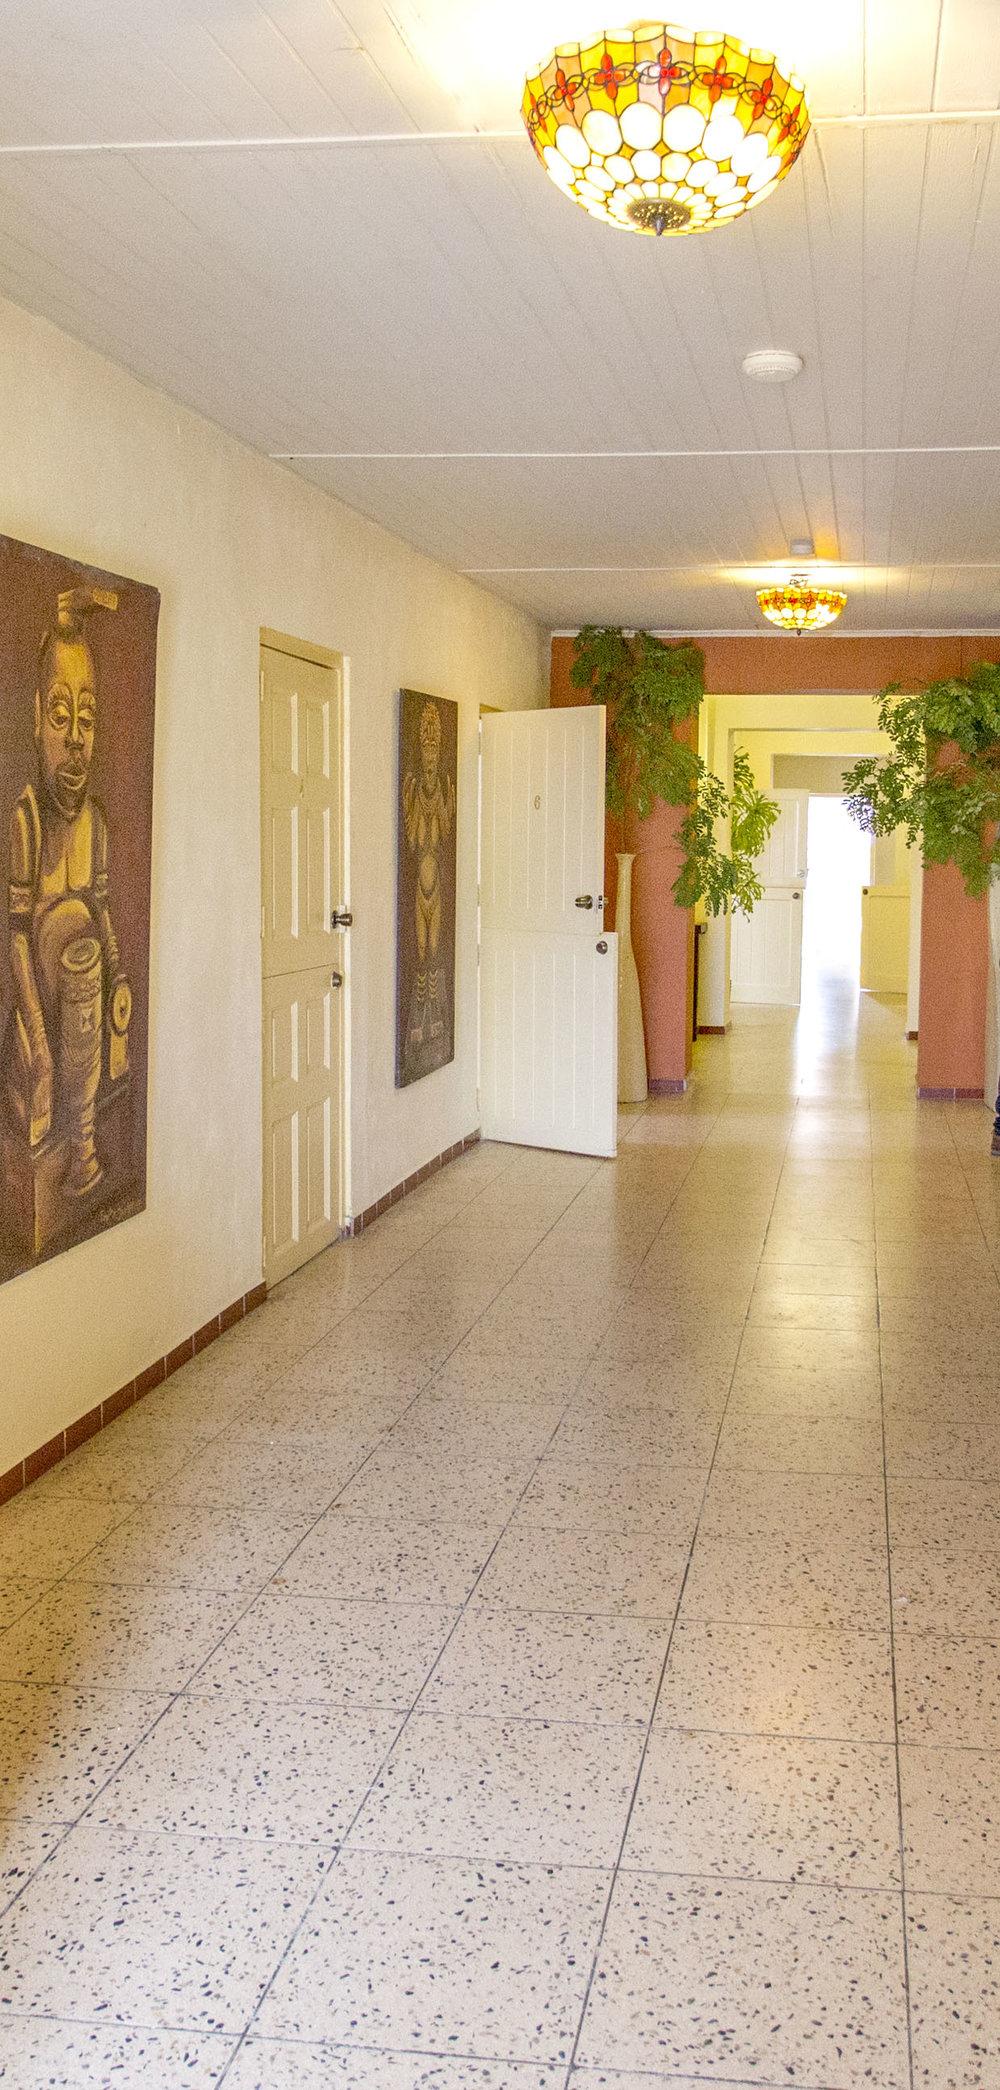 StageDesk-Curaçao-Stagehuis-BergAltena-Pelikaan-huis44.jpg